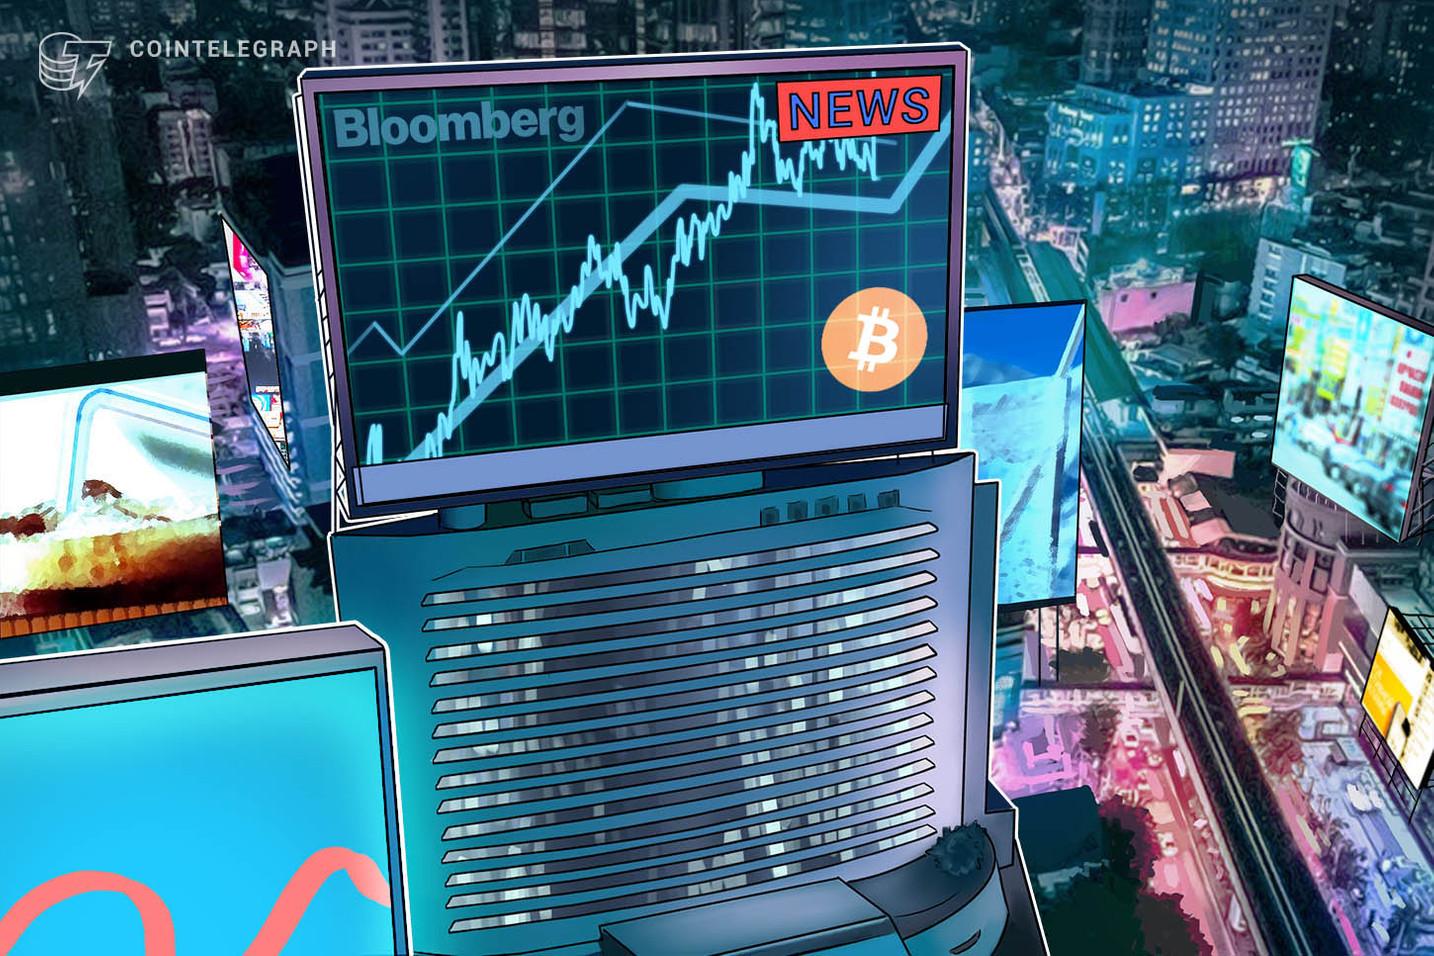 Bloomberg: recentes altas do Bitcoin podem estar ligadas ao algotrading